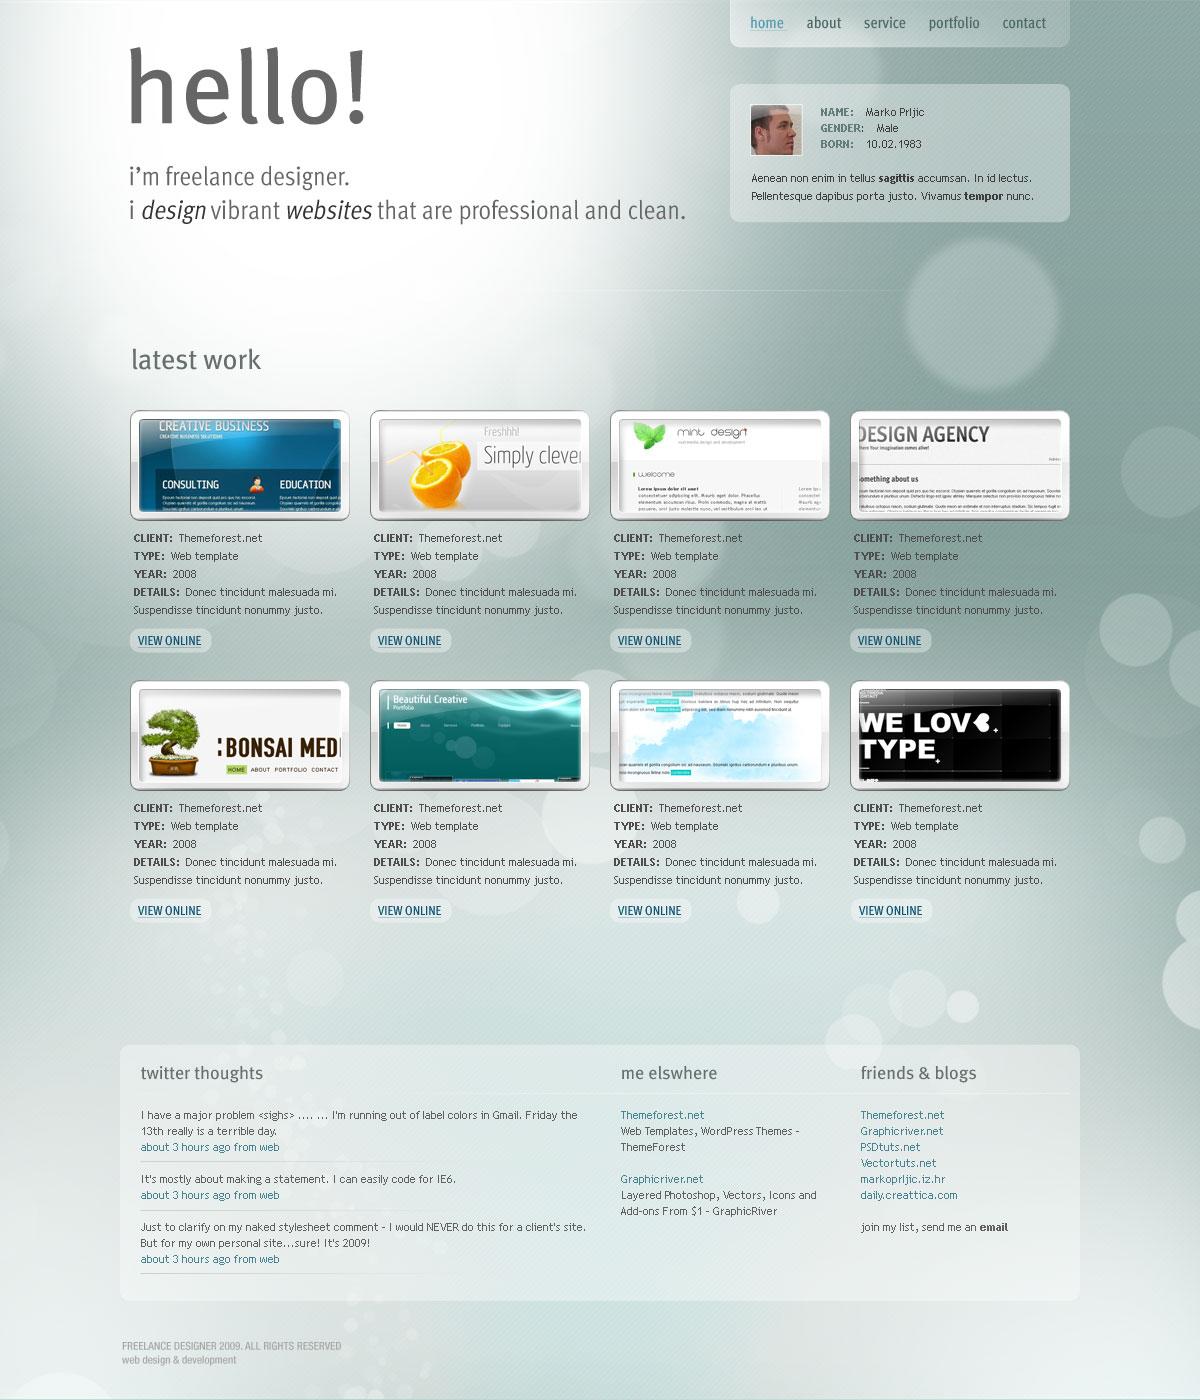 Freelance Designer - Personal Portfolio Template